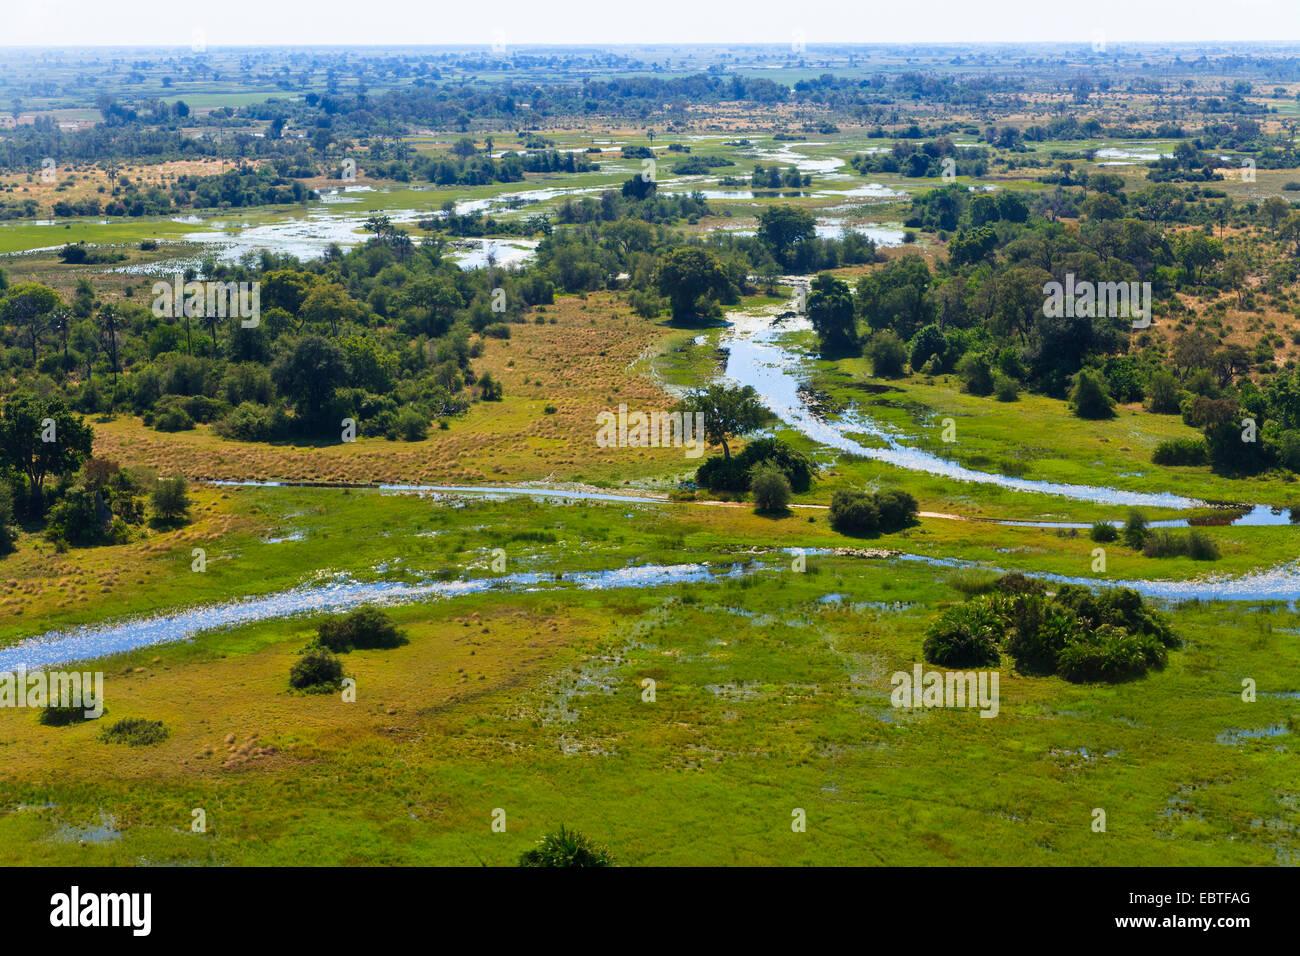 aerial view of the Okavango Delta, Botswana, Okavango Delta - Stock Image